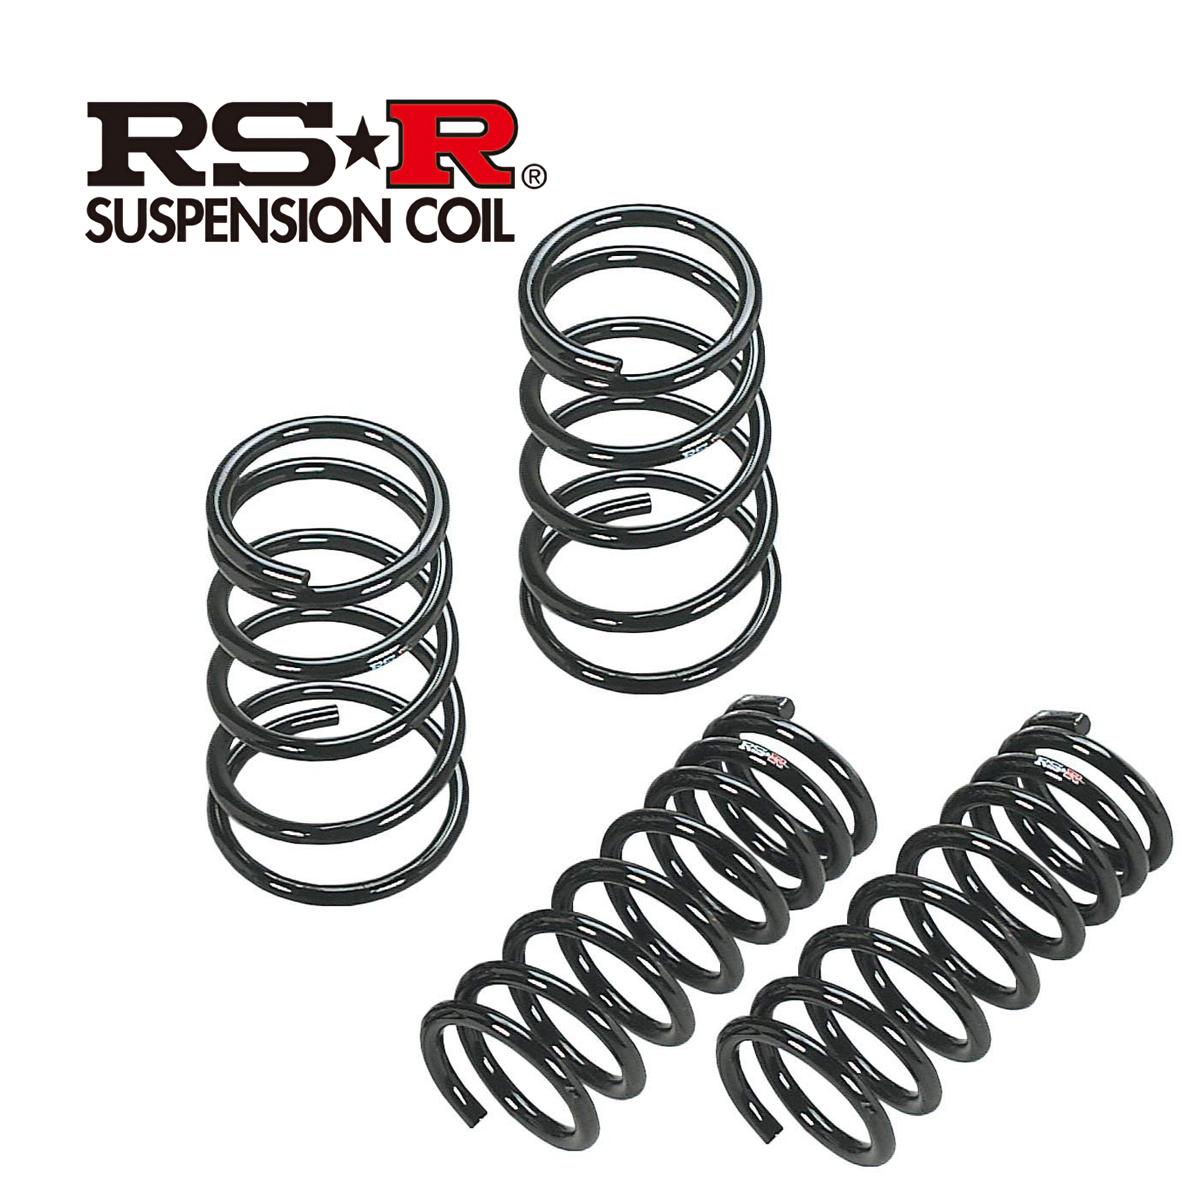 RS-R ステップワゴン スパーダ Z RK6 ダウンサス スプリング フロント H721WF RSR 個人宅発送追金有